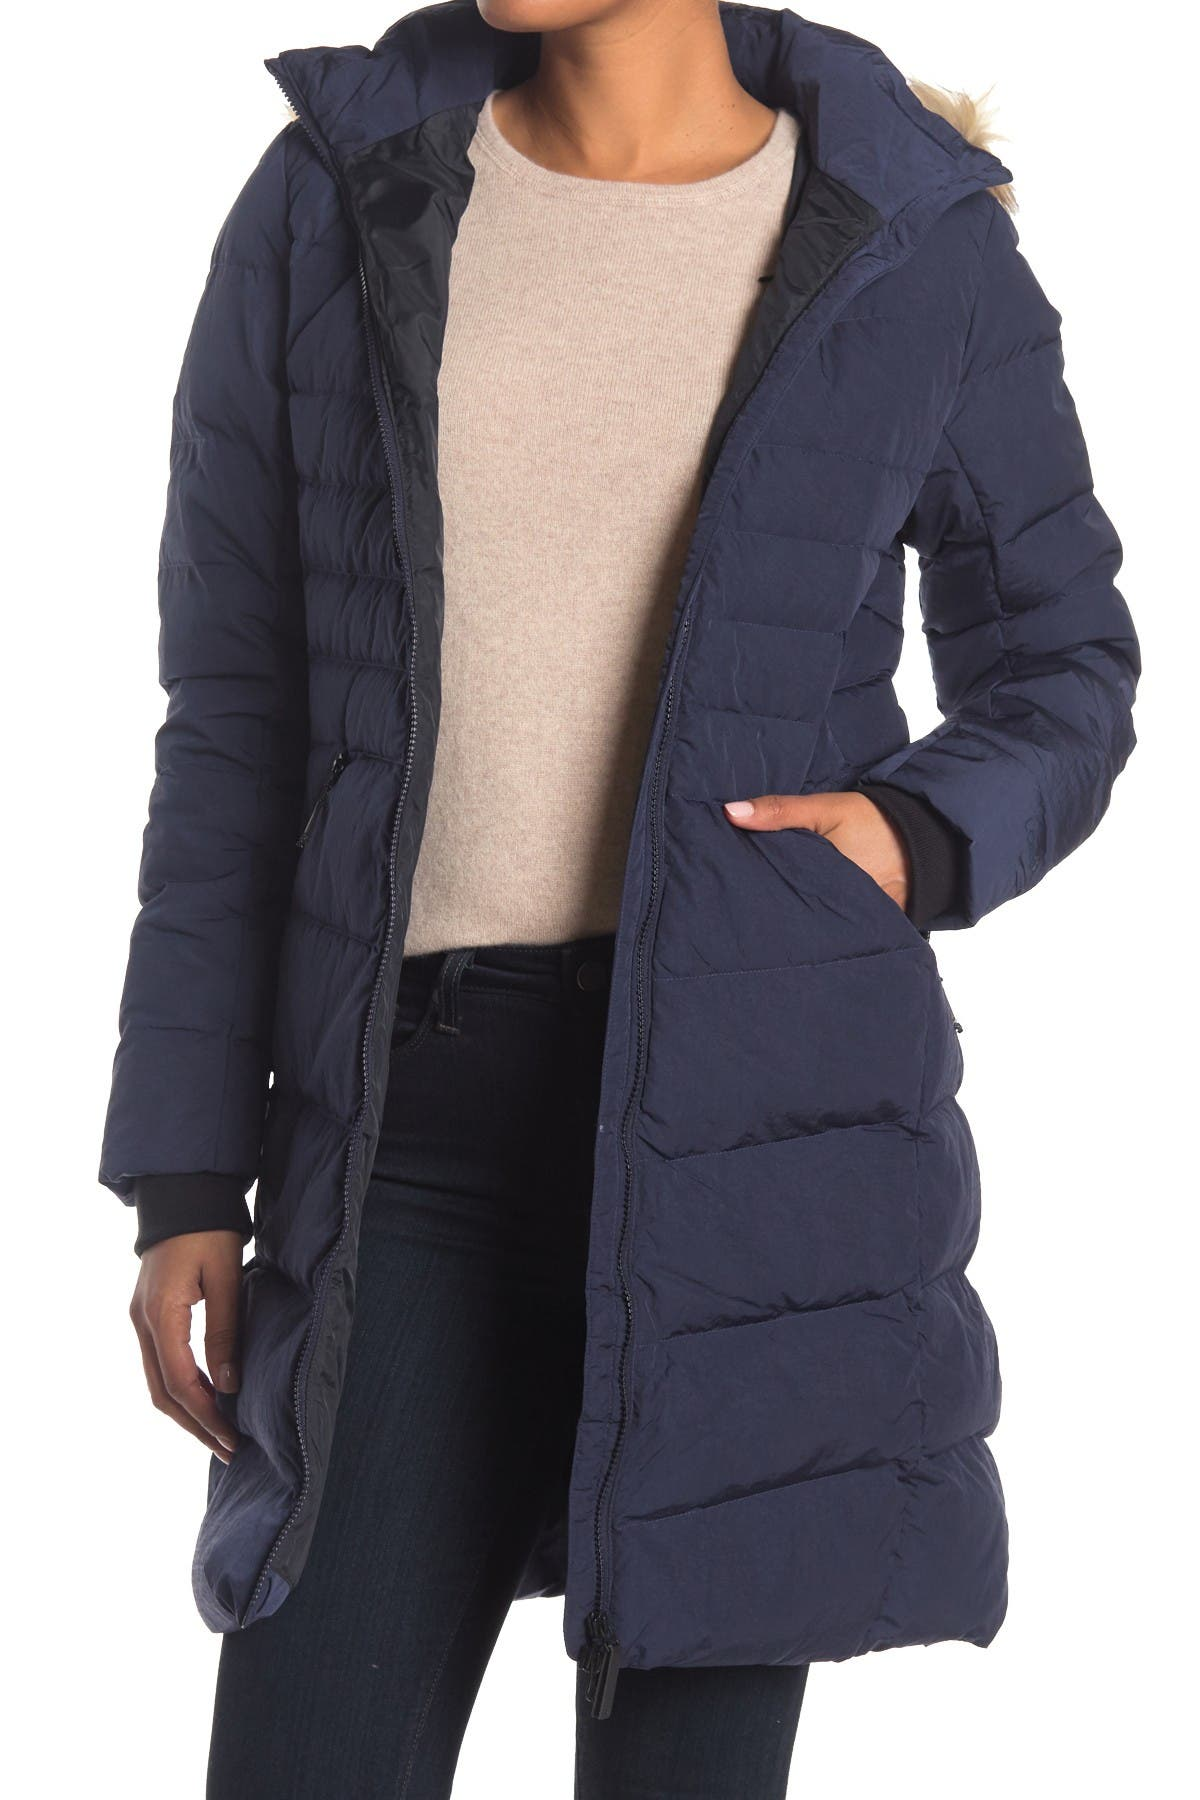 Image of Lole Katie Faux Fur Trim Hooded Down Jacket